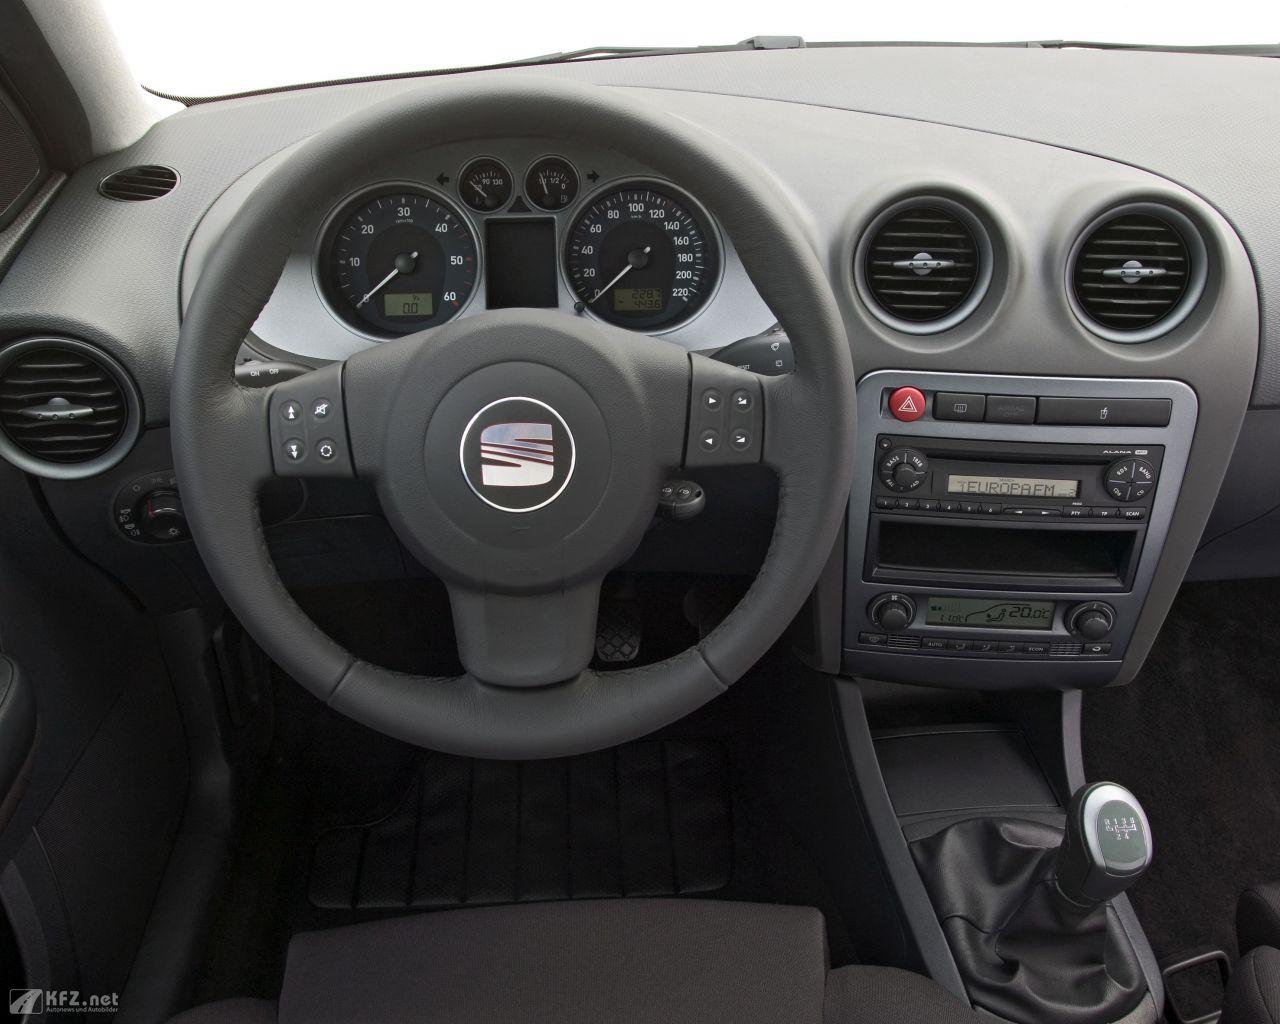 seat-cordoba-1280x1024-2